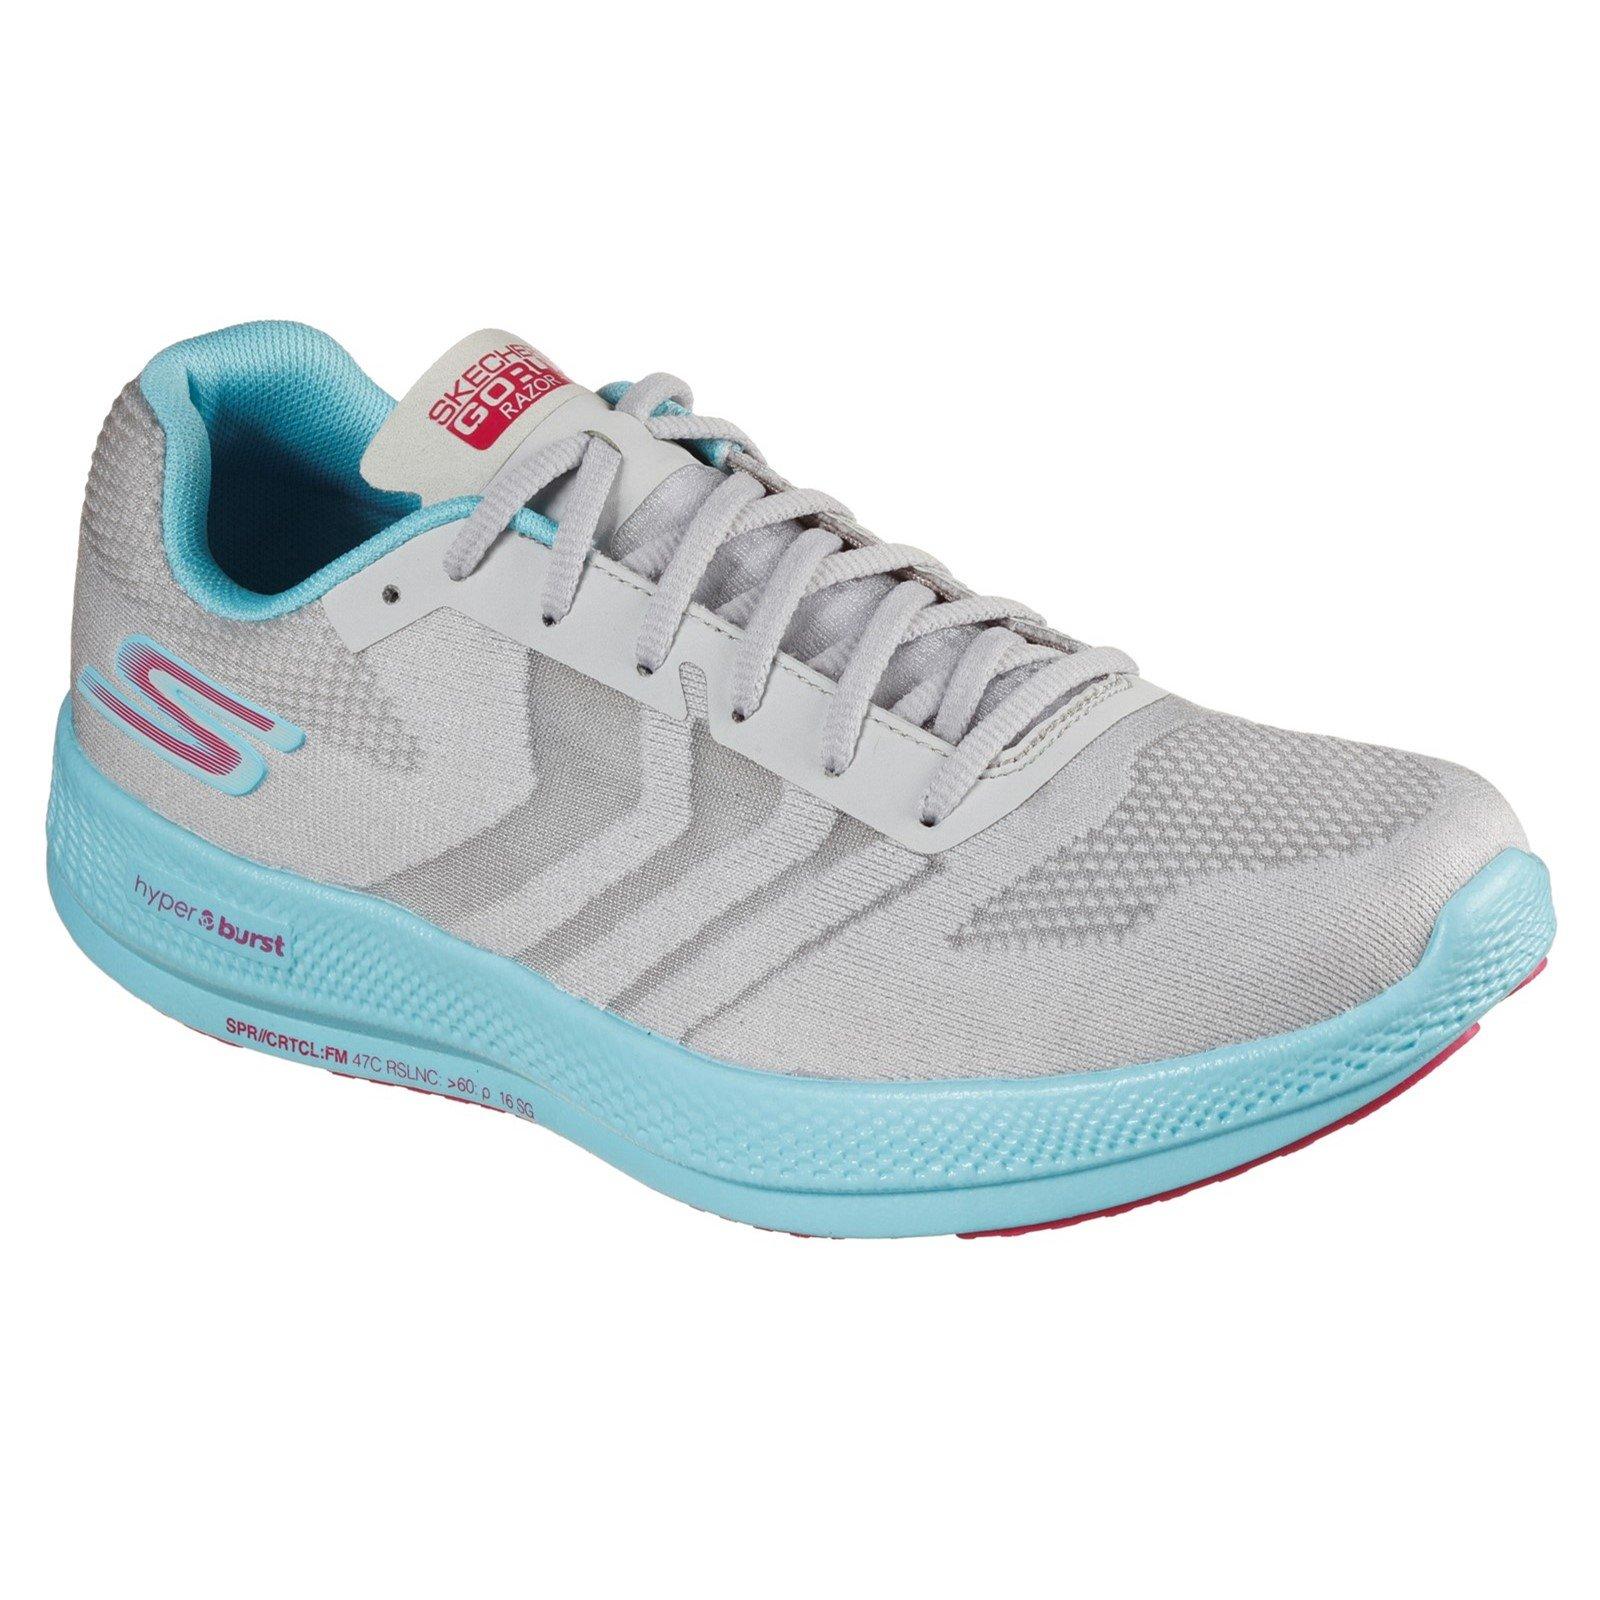 Skechers Women's Go Run Razor Trainer Various Colours 32703 - Grey/Aqua/Pink 4